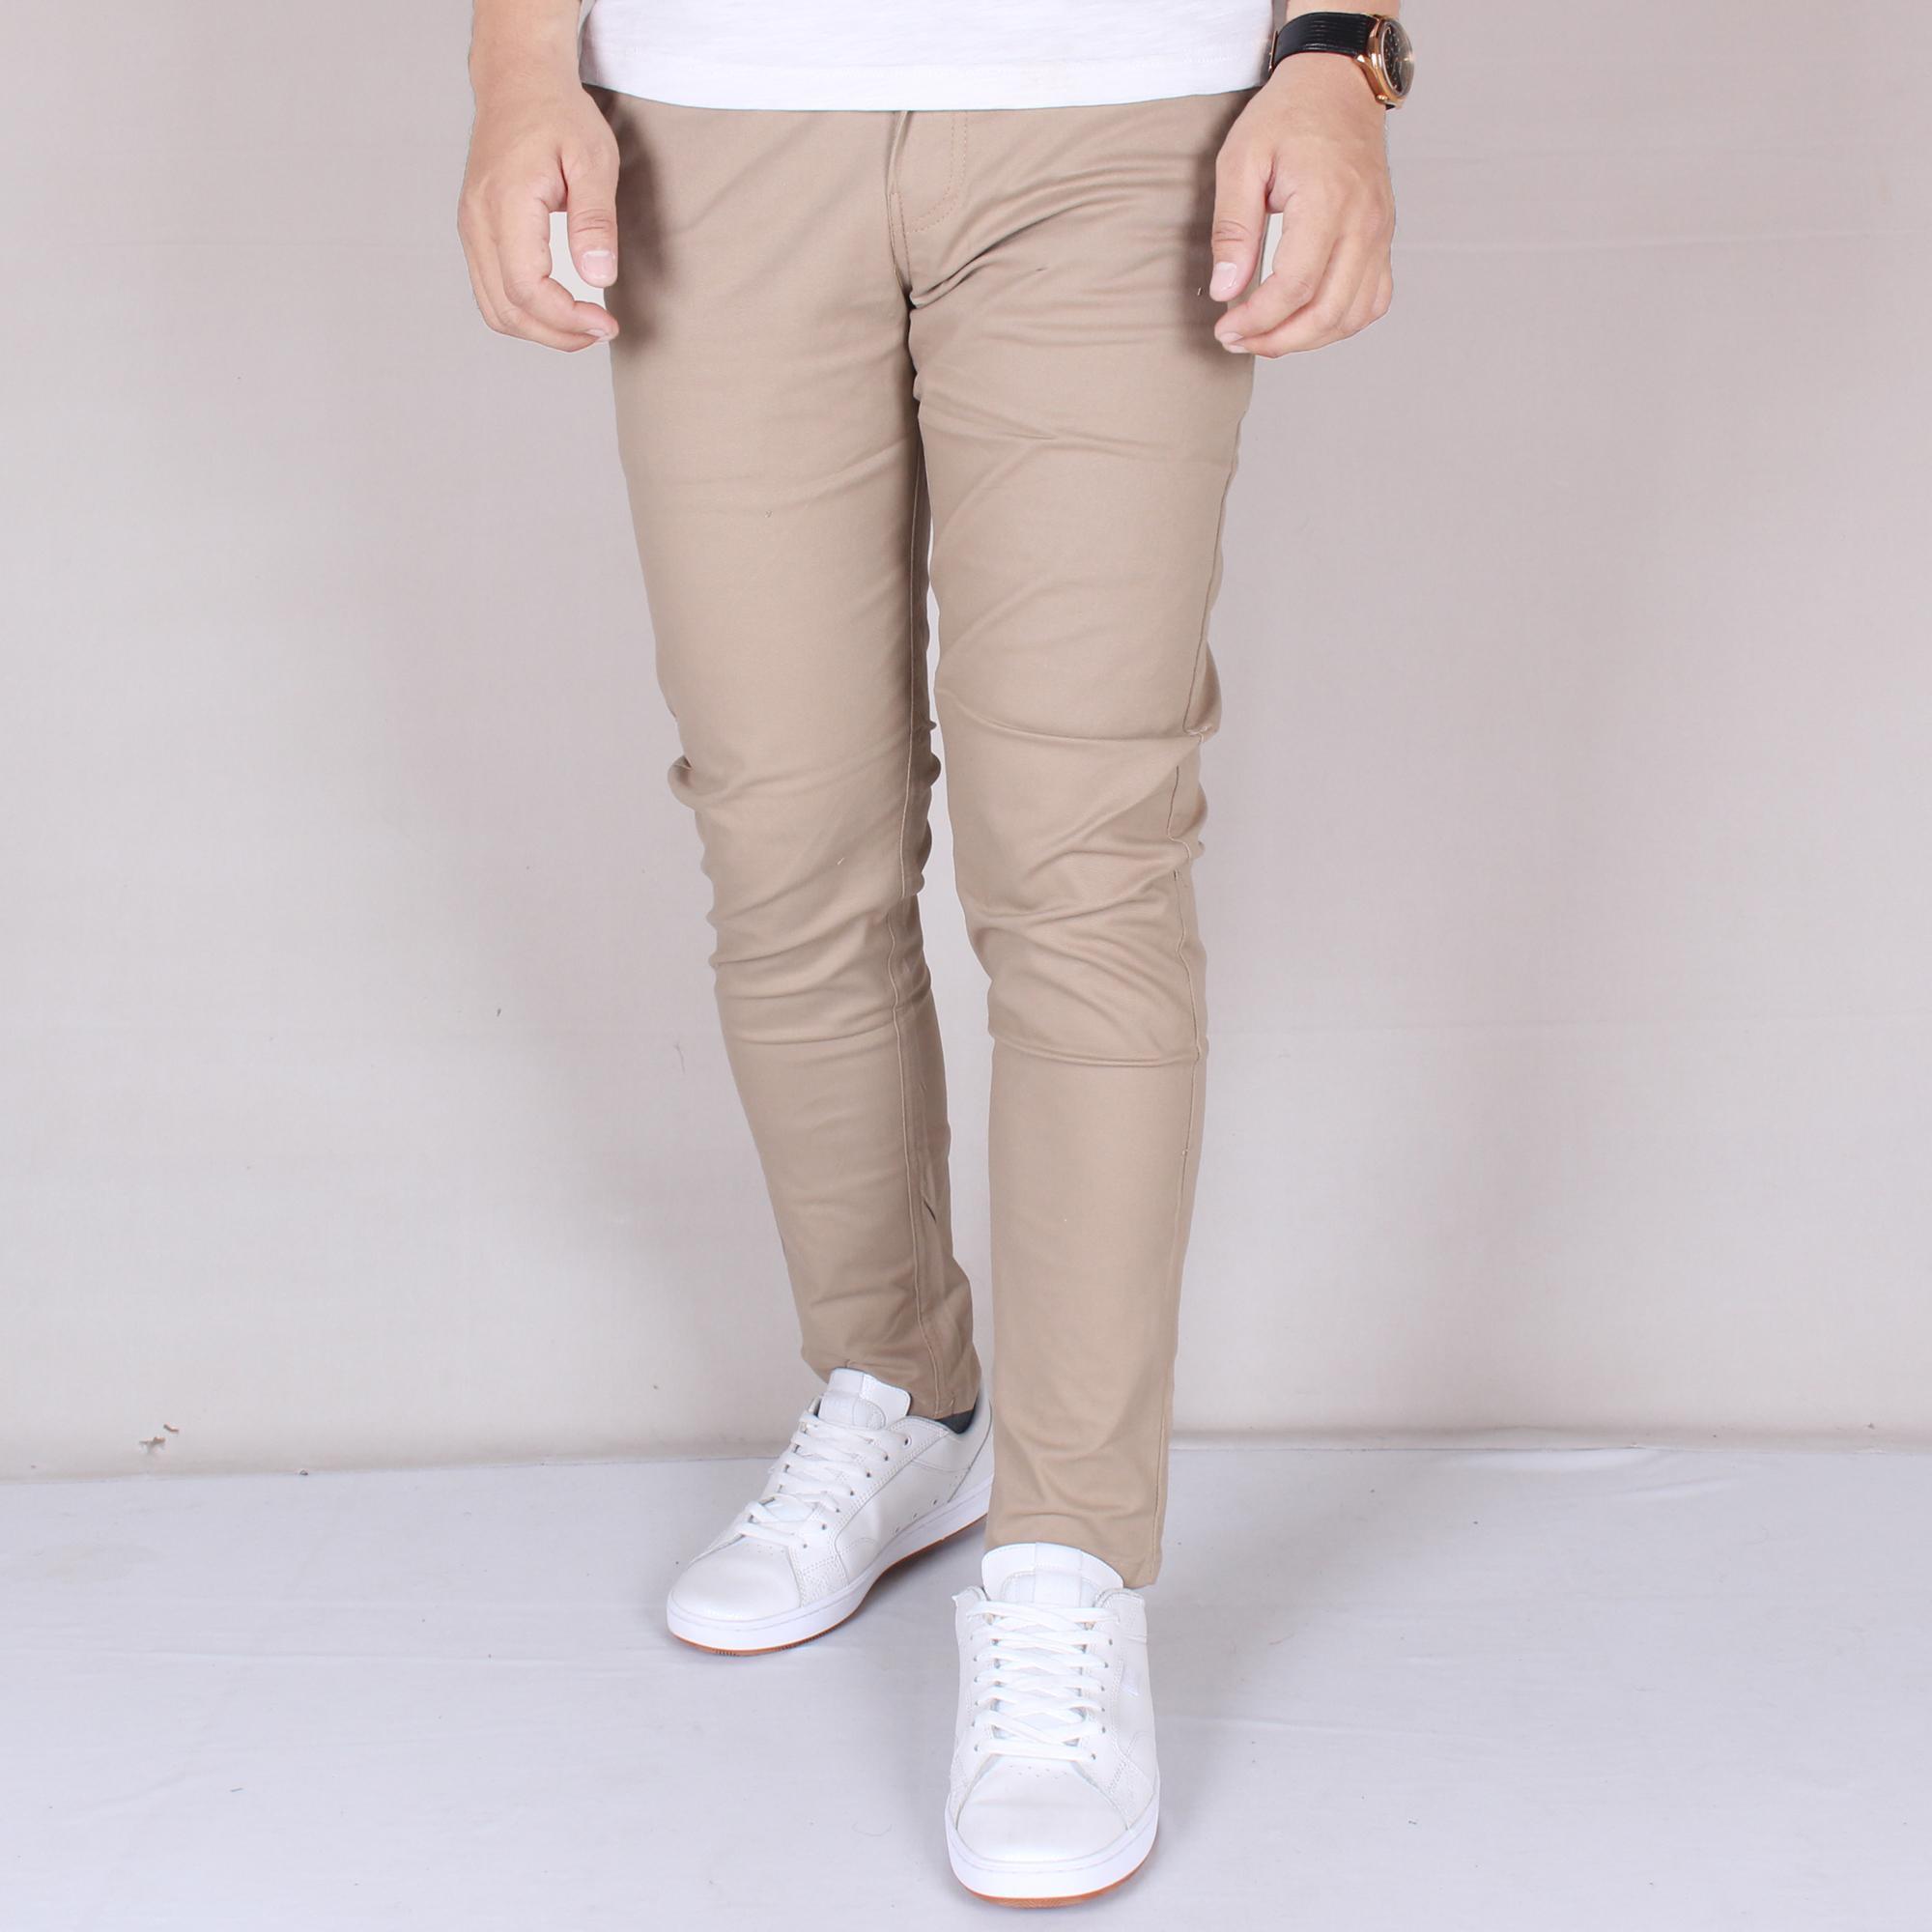 Pants Chino Celana Pendek Pria Zoeystore1 6016 Formal Panjang Cowok Kerja Kantoran Exclusive Mocca Simple